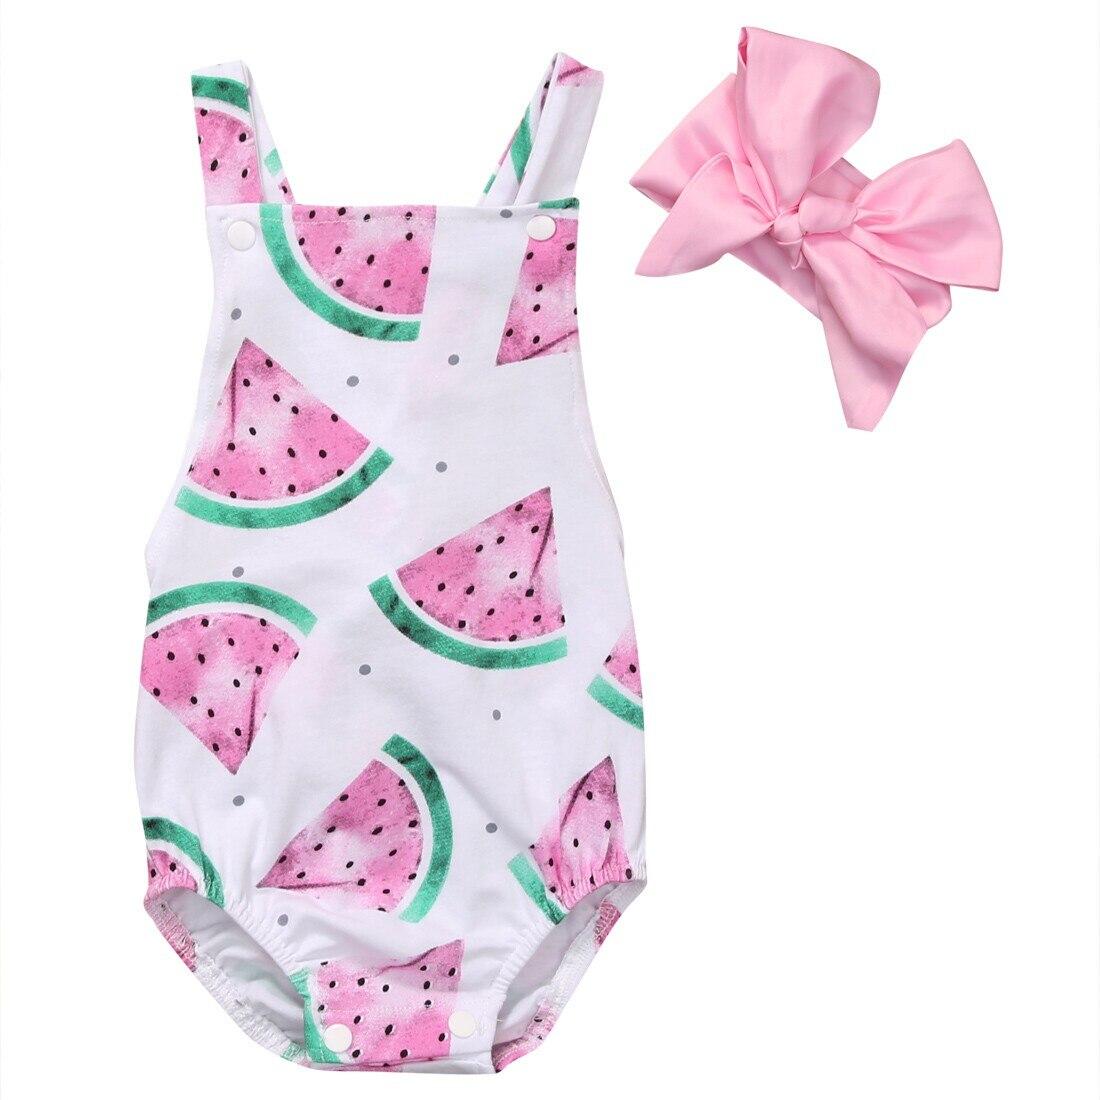 Newborn Baby Girl Romper Clothes Summer Sleeveless watermelon Backless Jumpsuit +Headband 2PCS Outfits Sunsuit